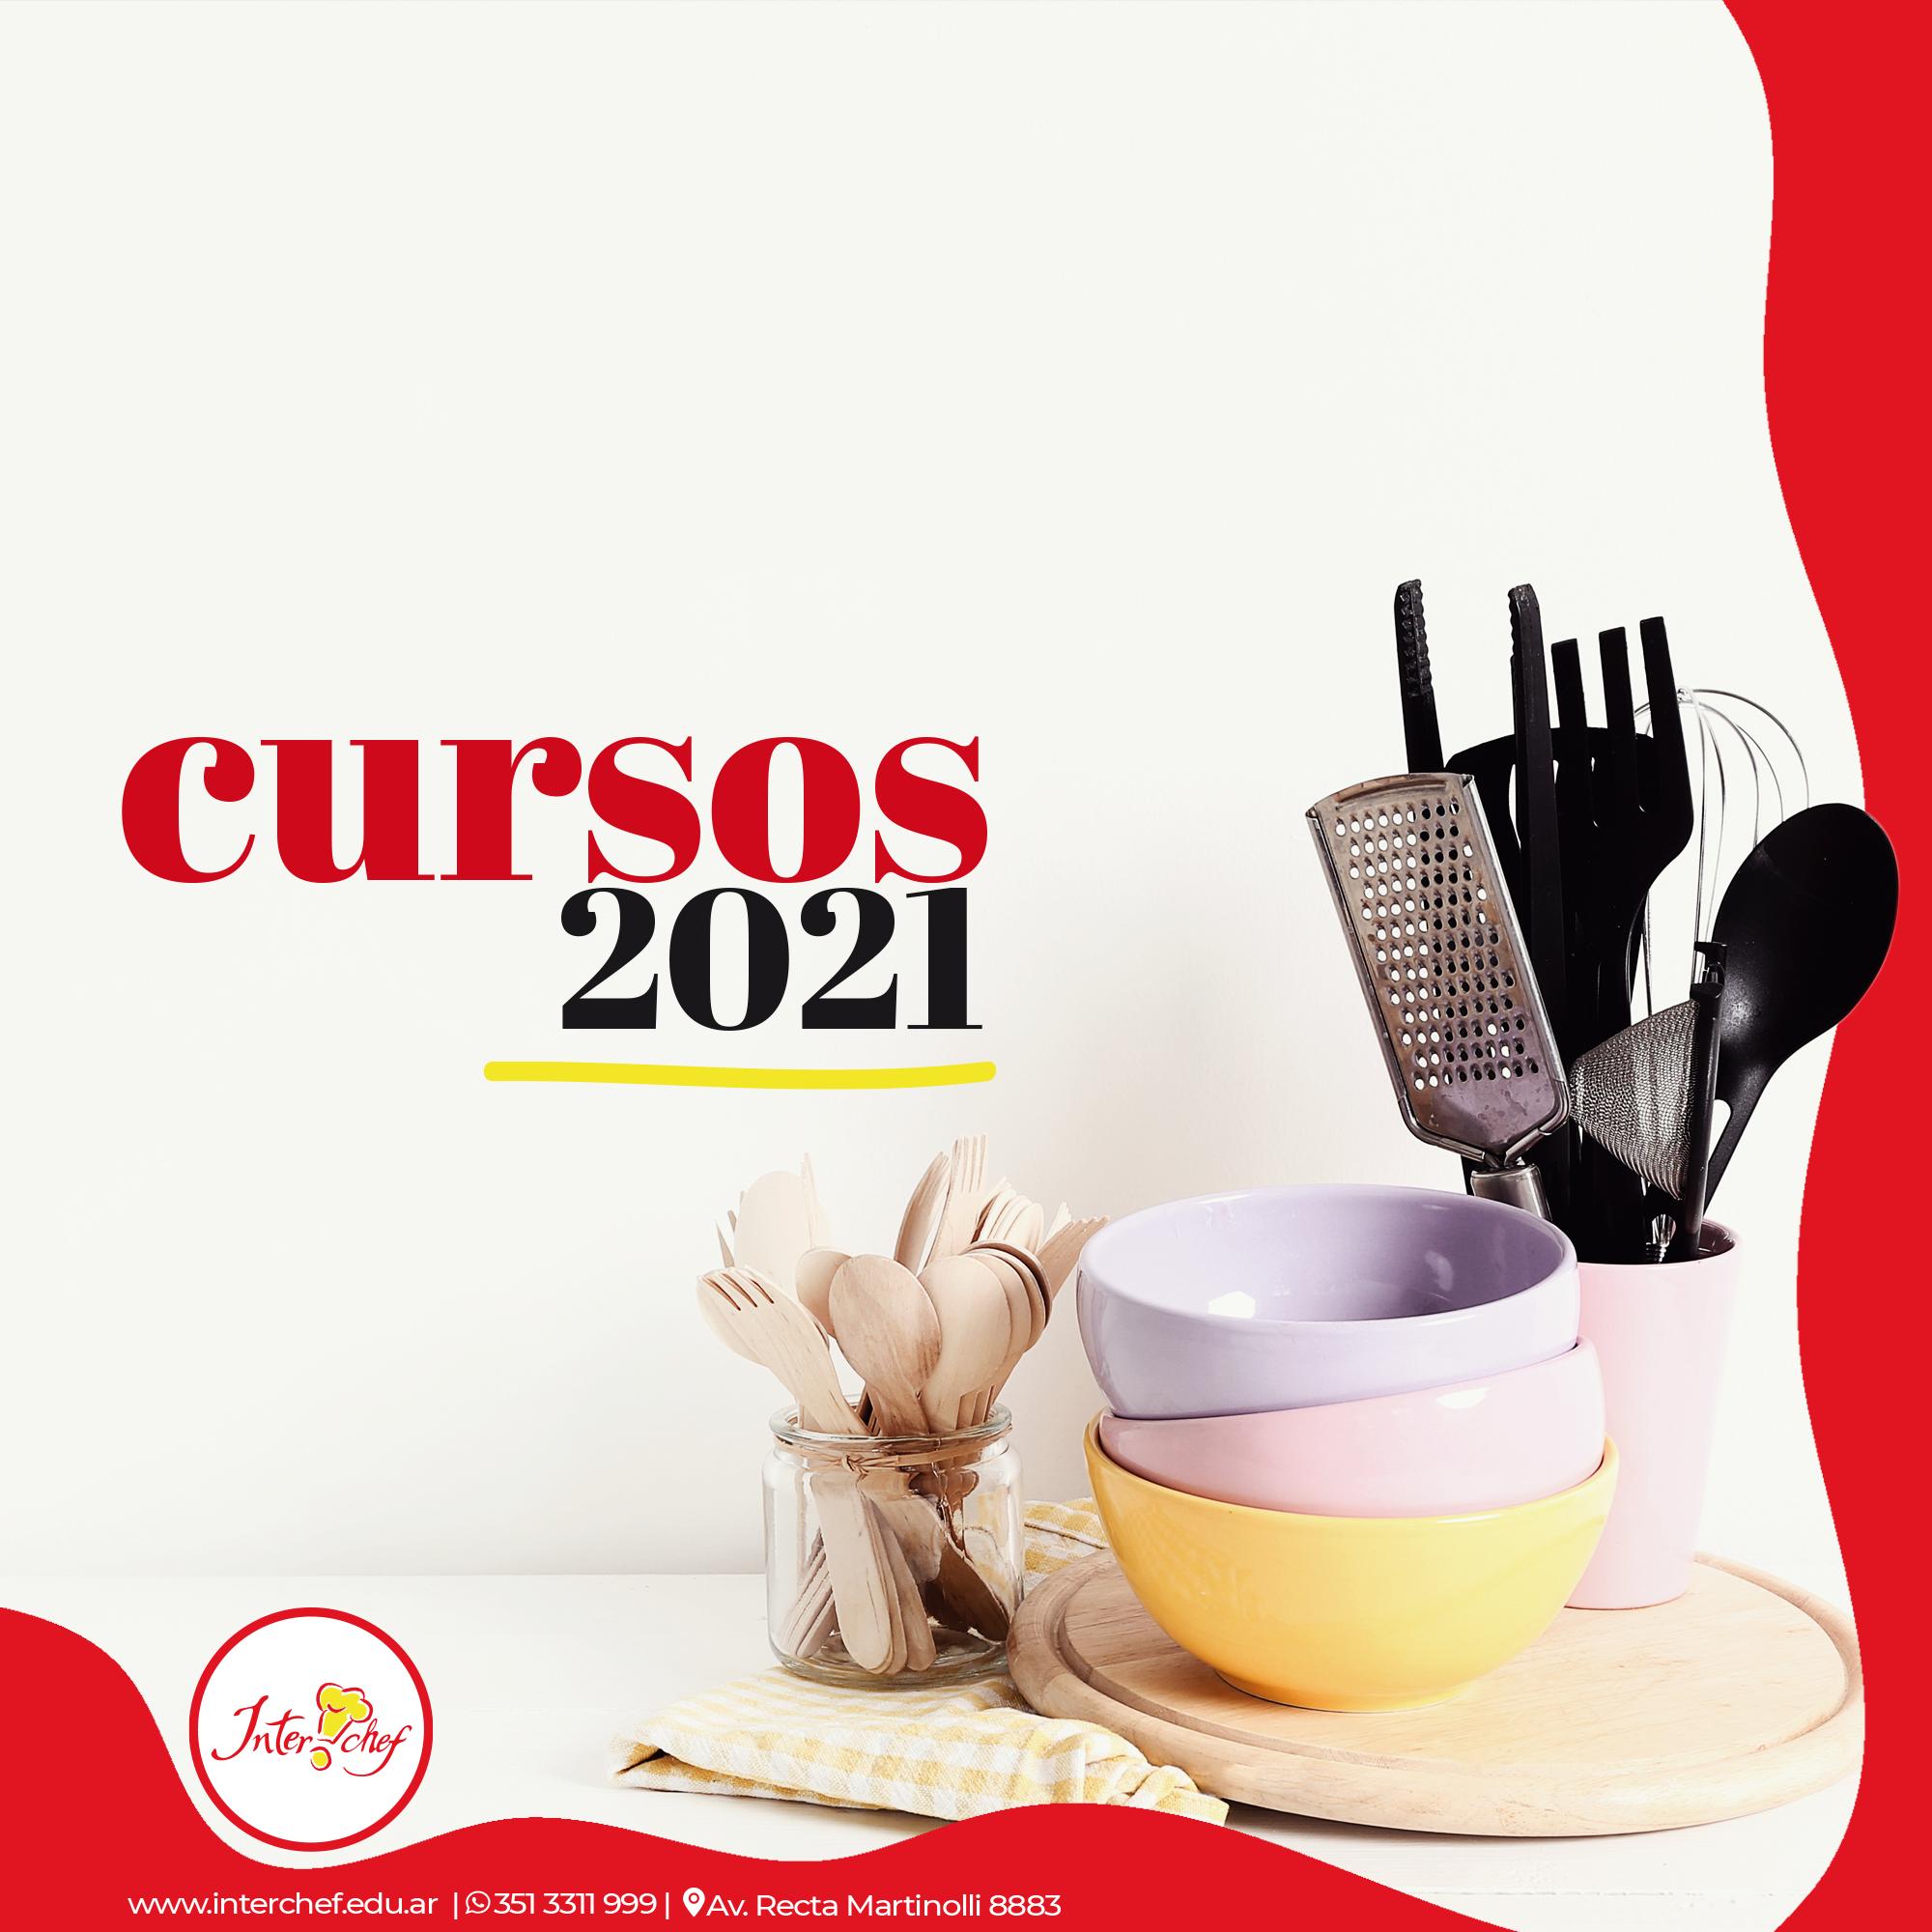 Cursos 2021 ¿A cuál te vas a anotar?